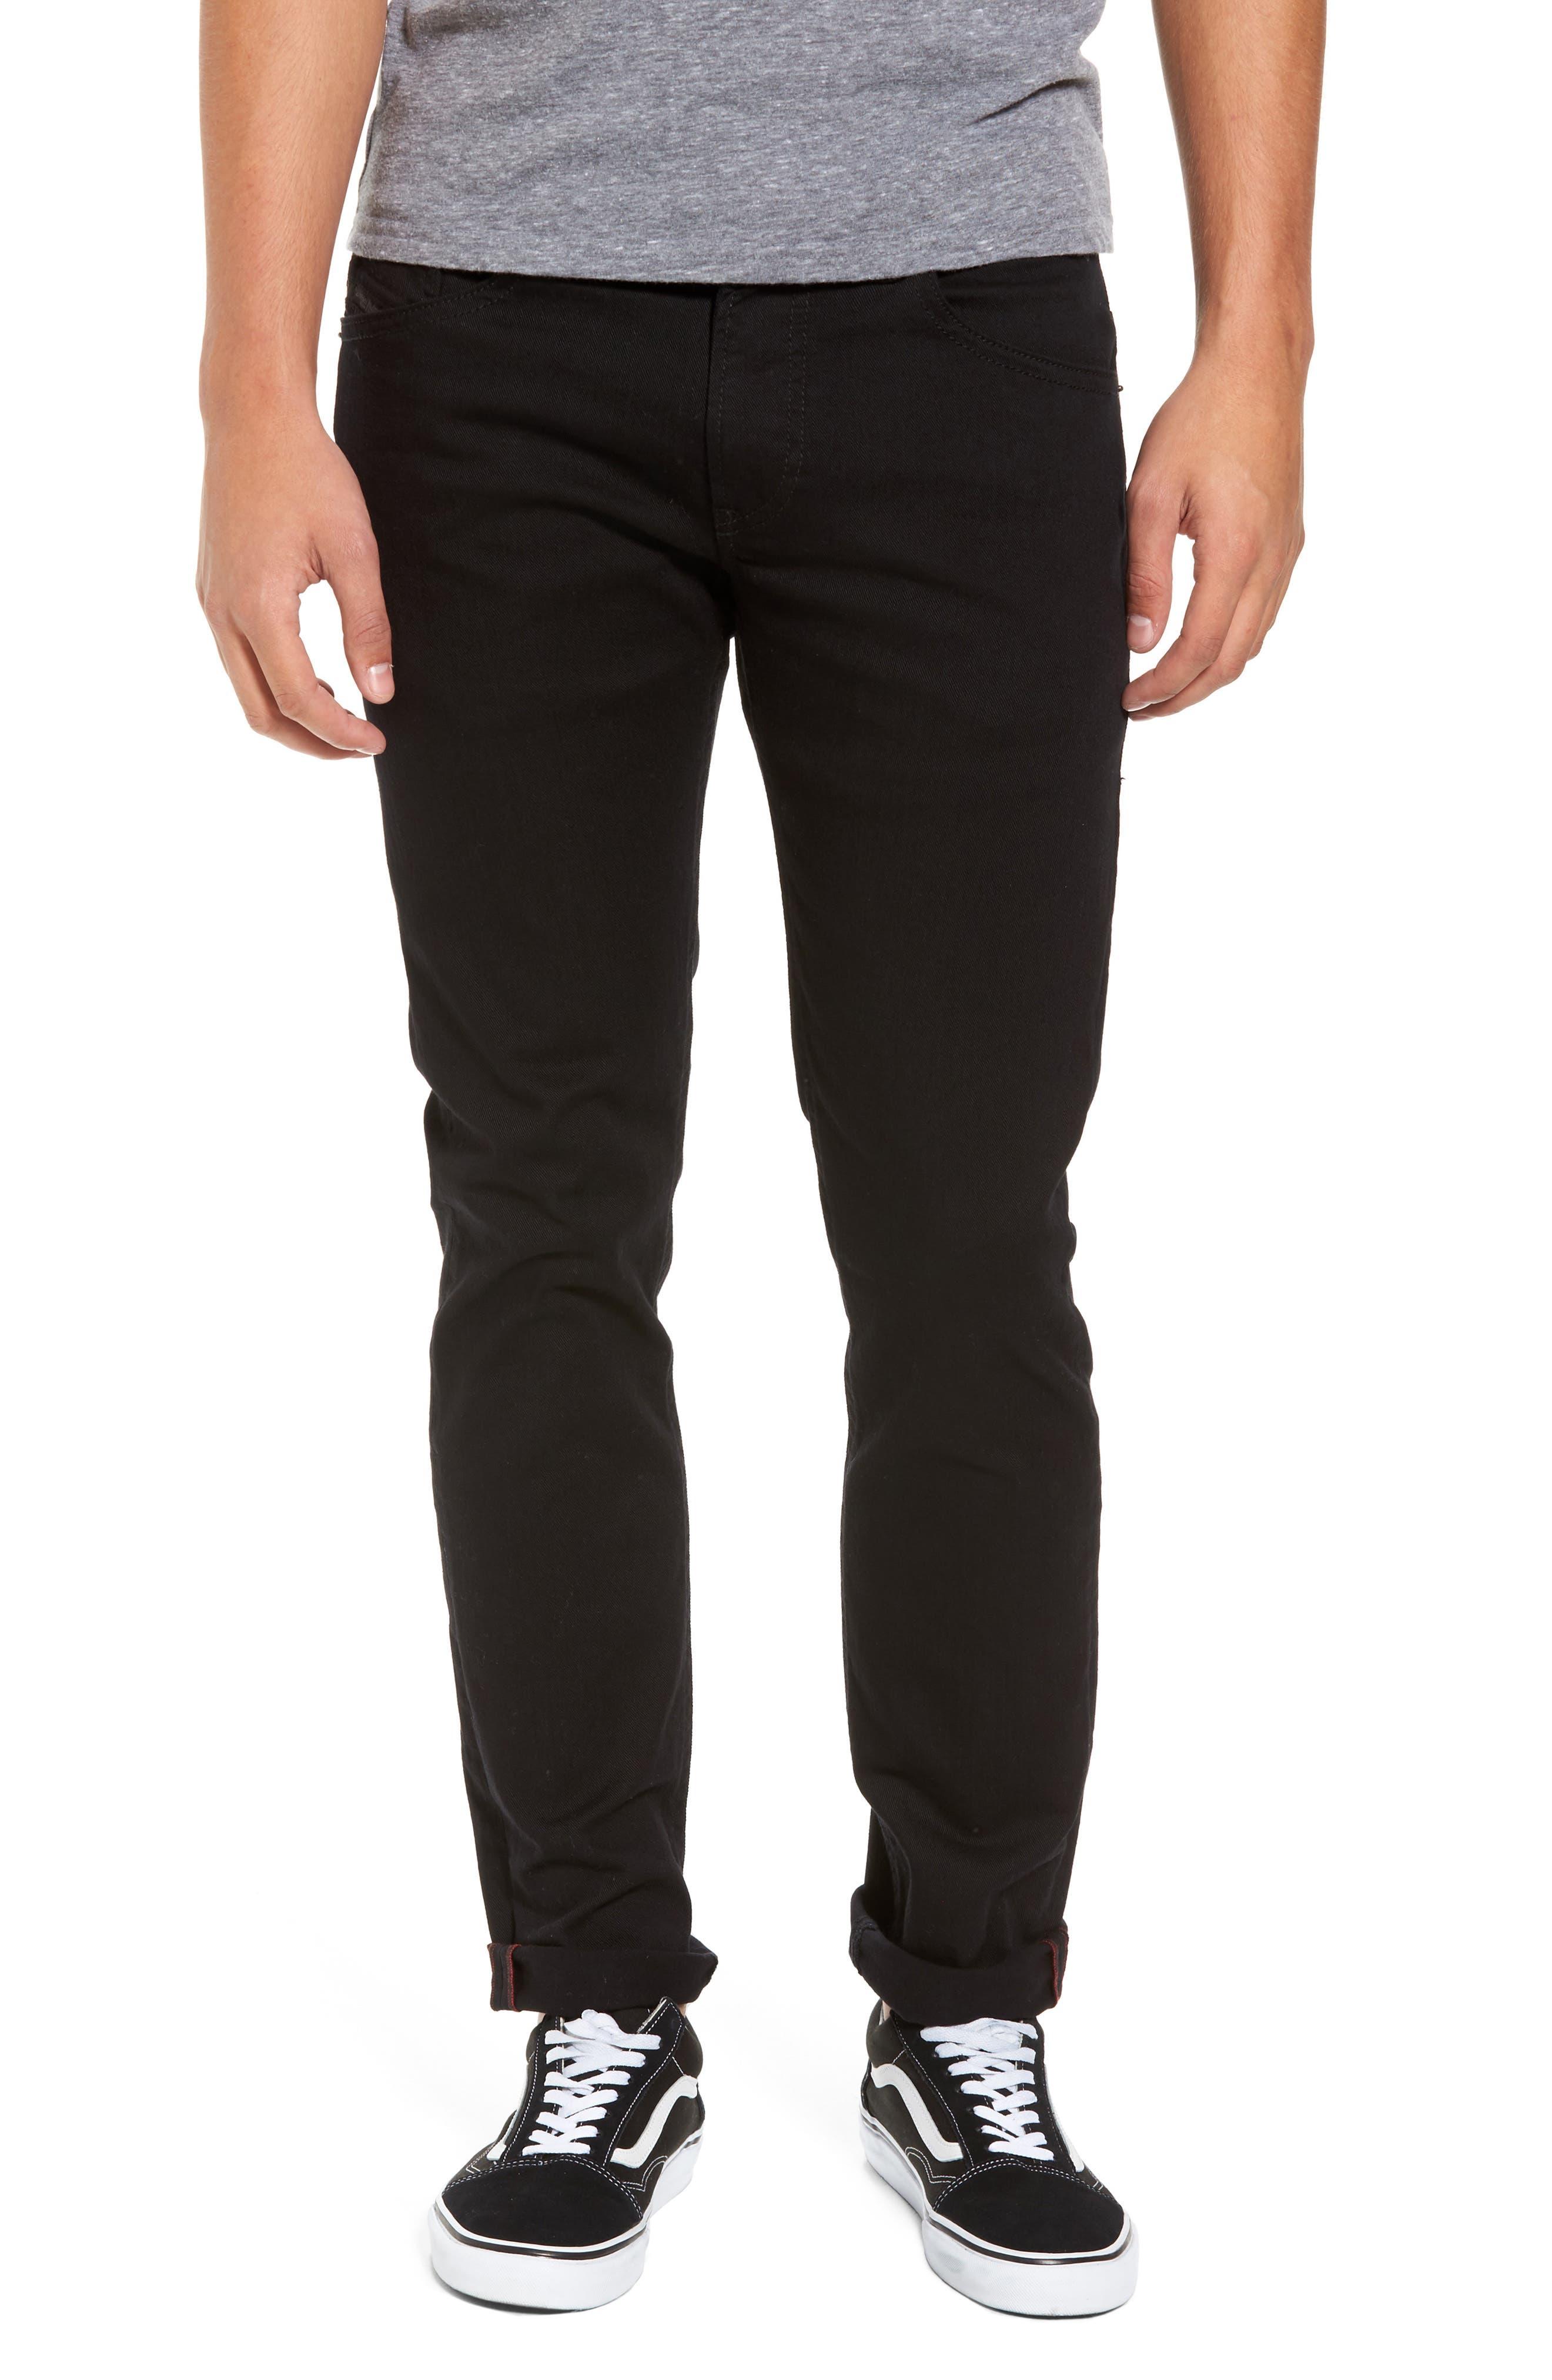 DIESEL<SUP>®</SUP>, Thommer Slim Fit Jeans, Main thumbnail 1, color, BLACK/ DENIM